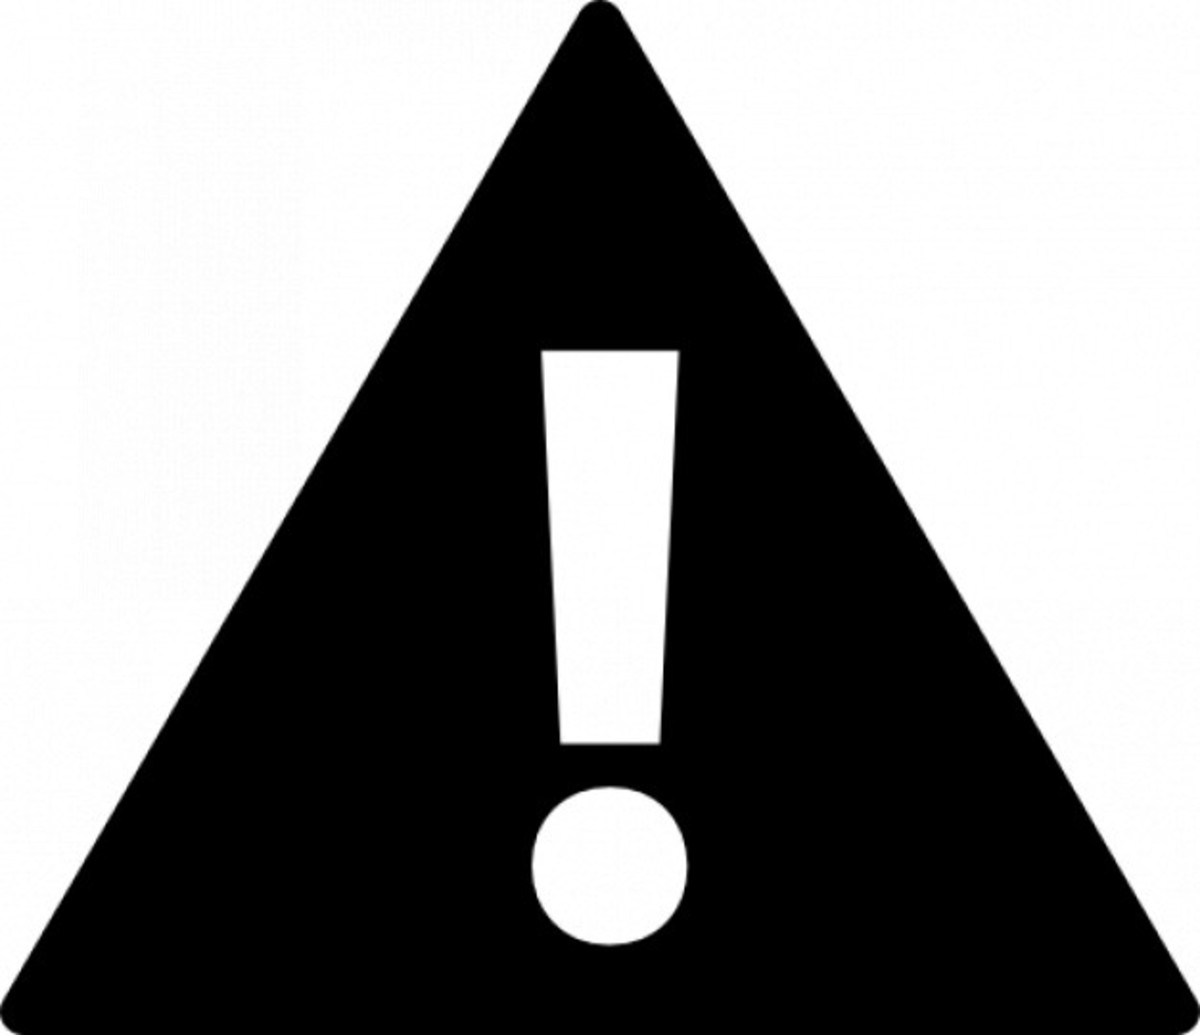 The Broken Link symbol